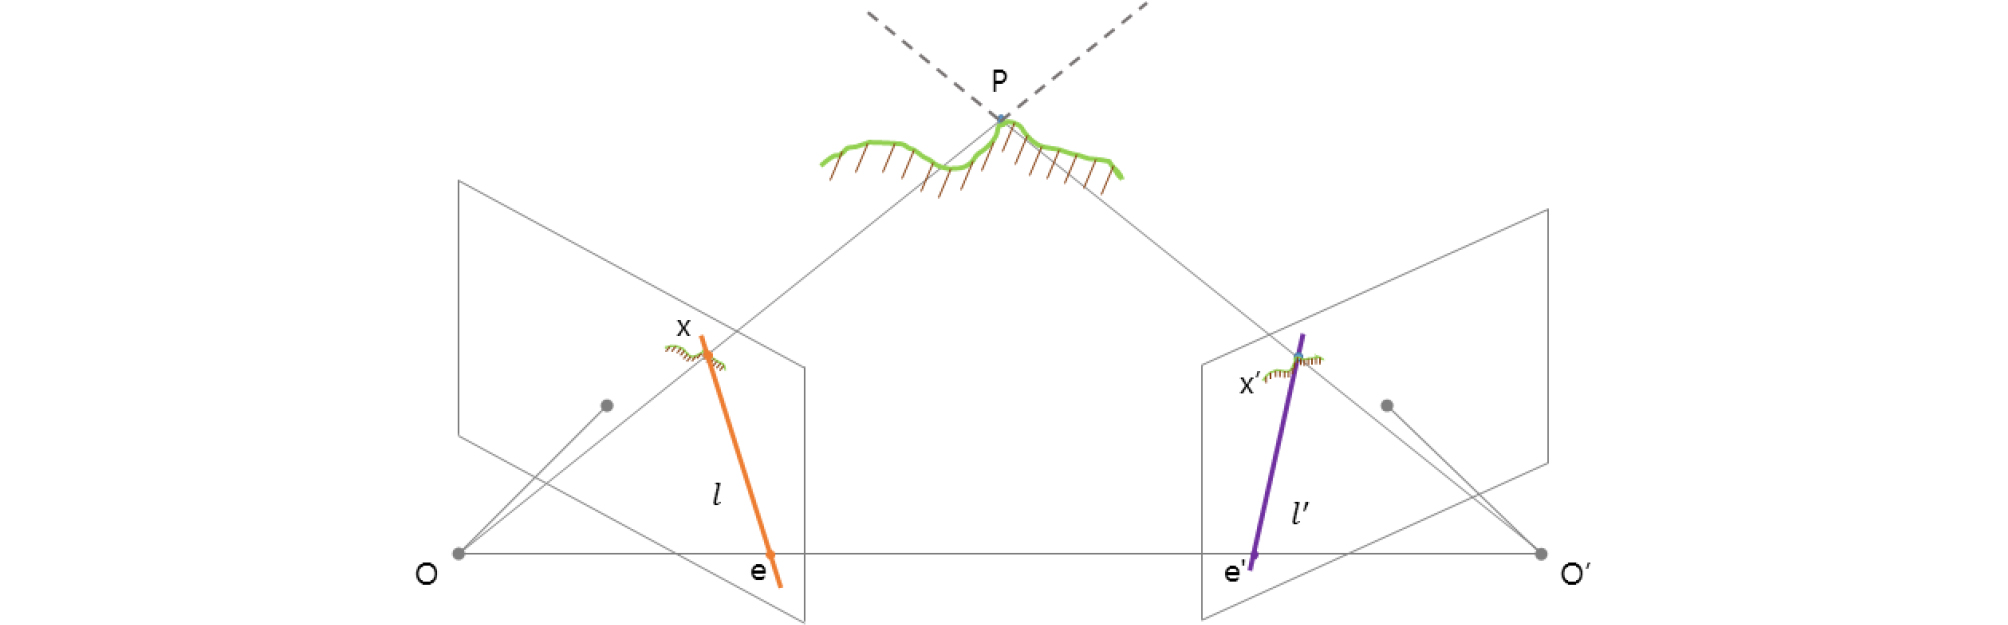 http://static.apub.kr/journalsite/sites/ksce/2020-040-02/N0110400215/images/Figure_KSCE_40_02_15_F3.jpg